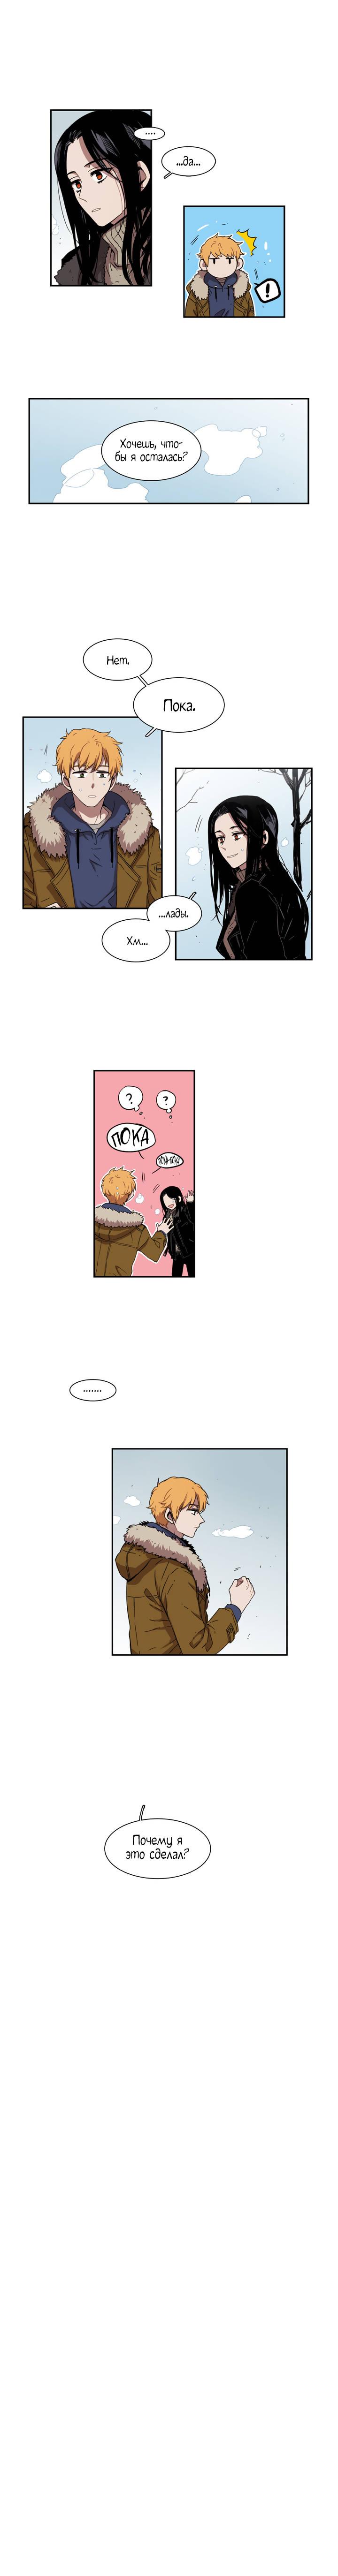 https://r1.ninemanga.com/comics/pic2/24/19800/332373/1503584349138.jpg Page 6